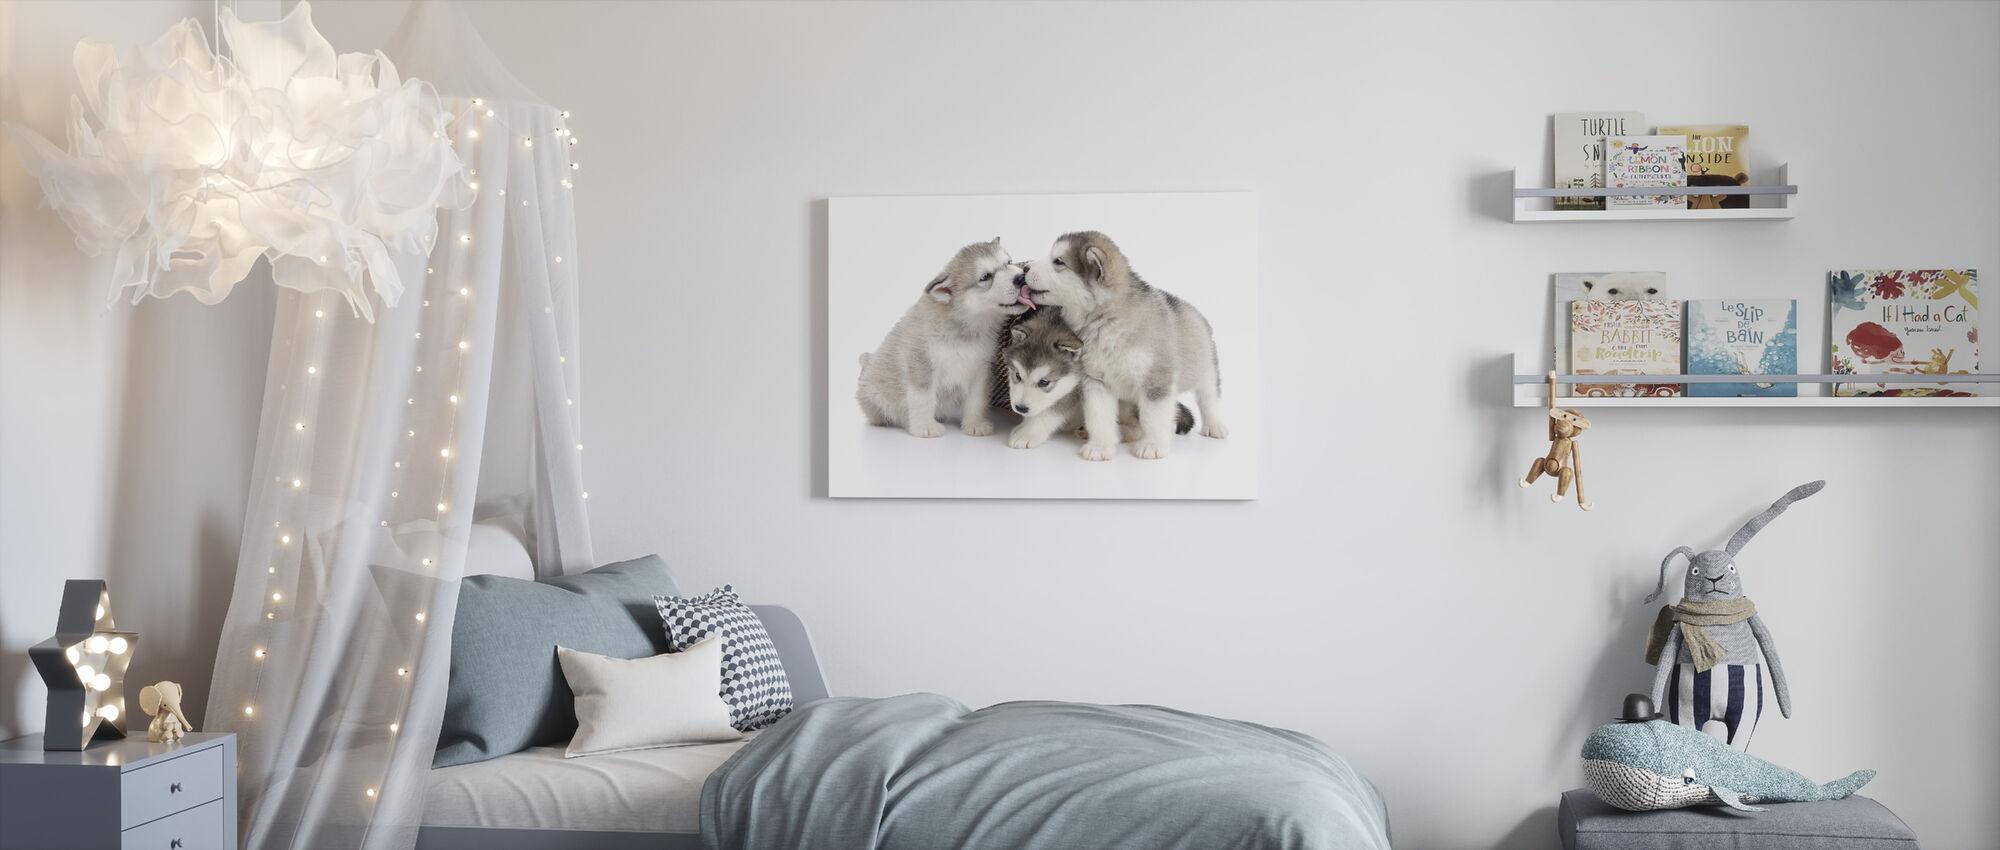 Friendly Puppies - Canvas print - Kids Room